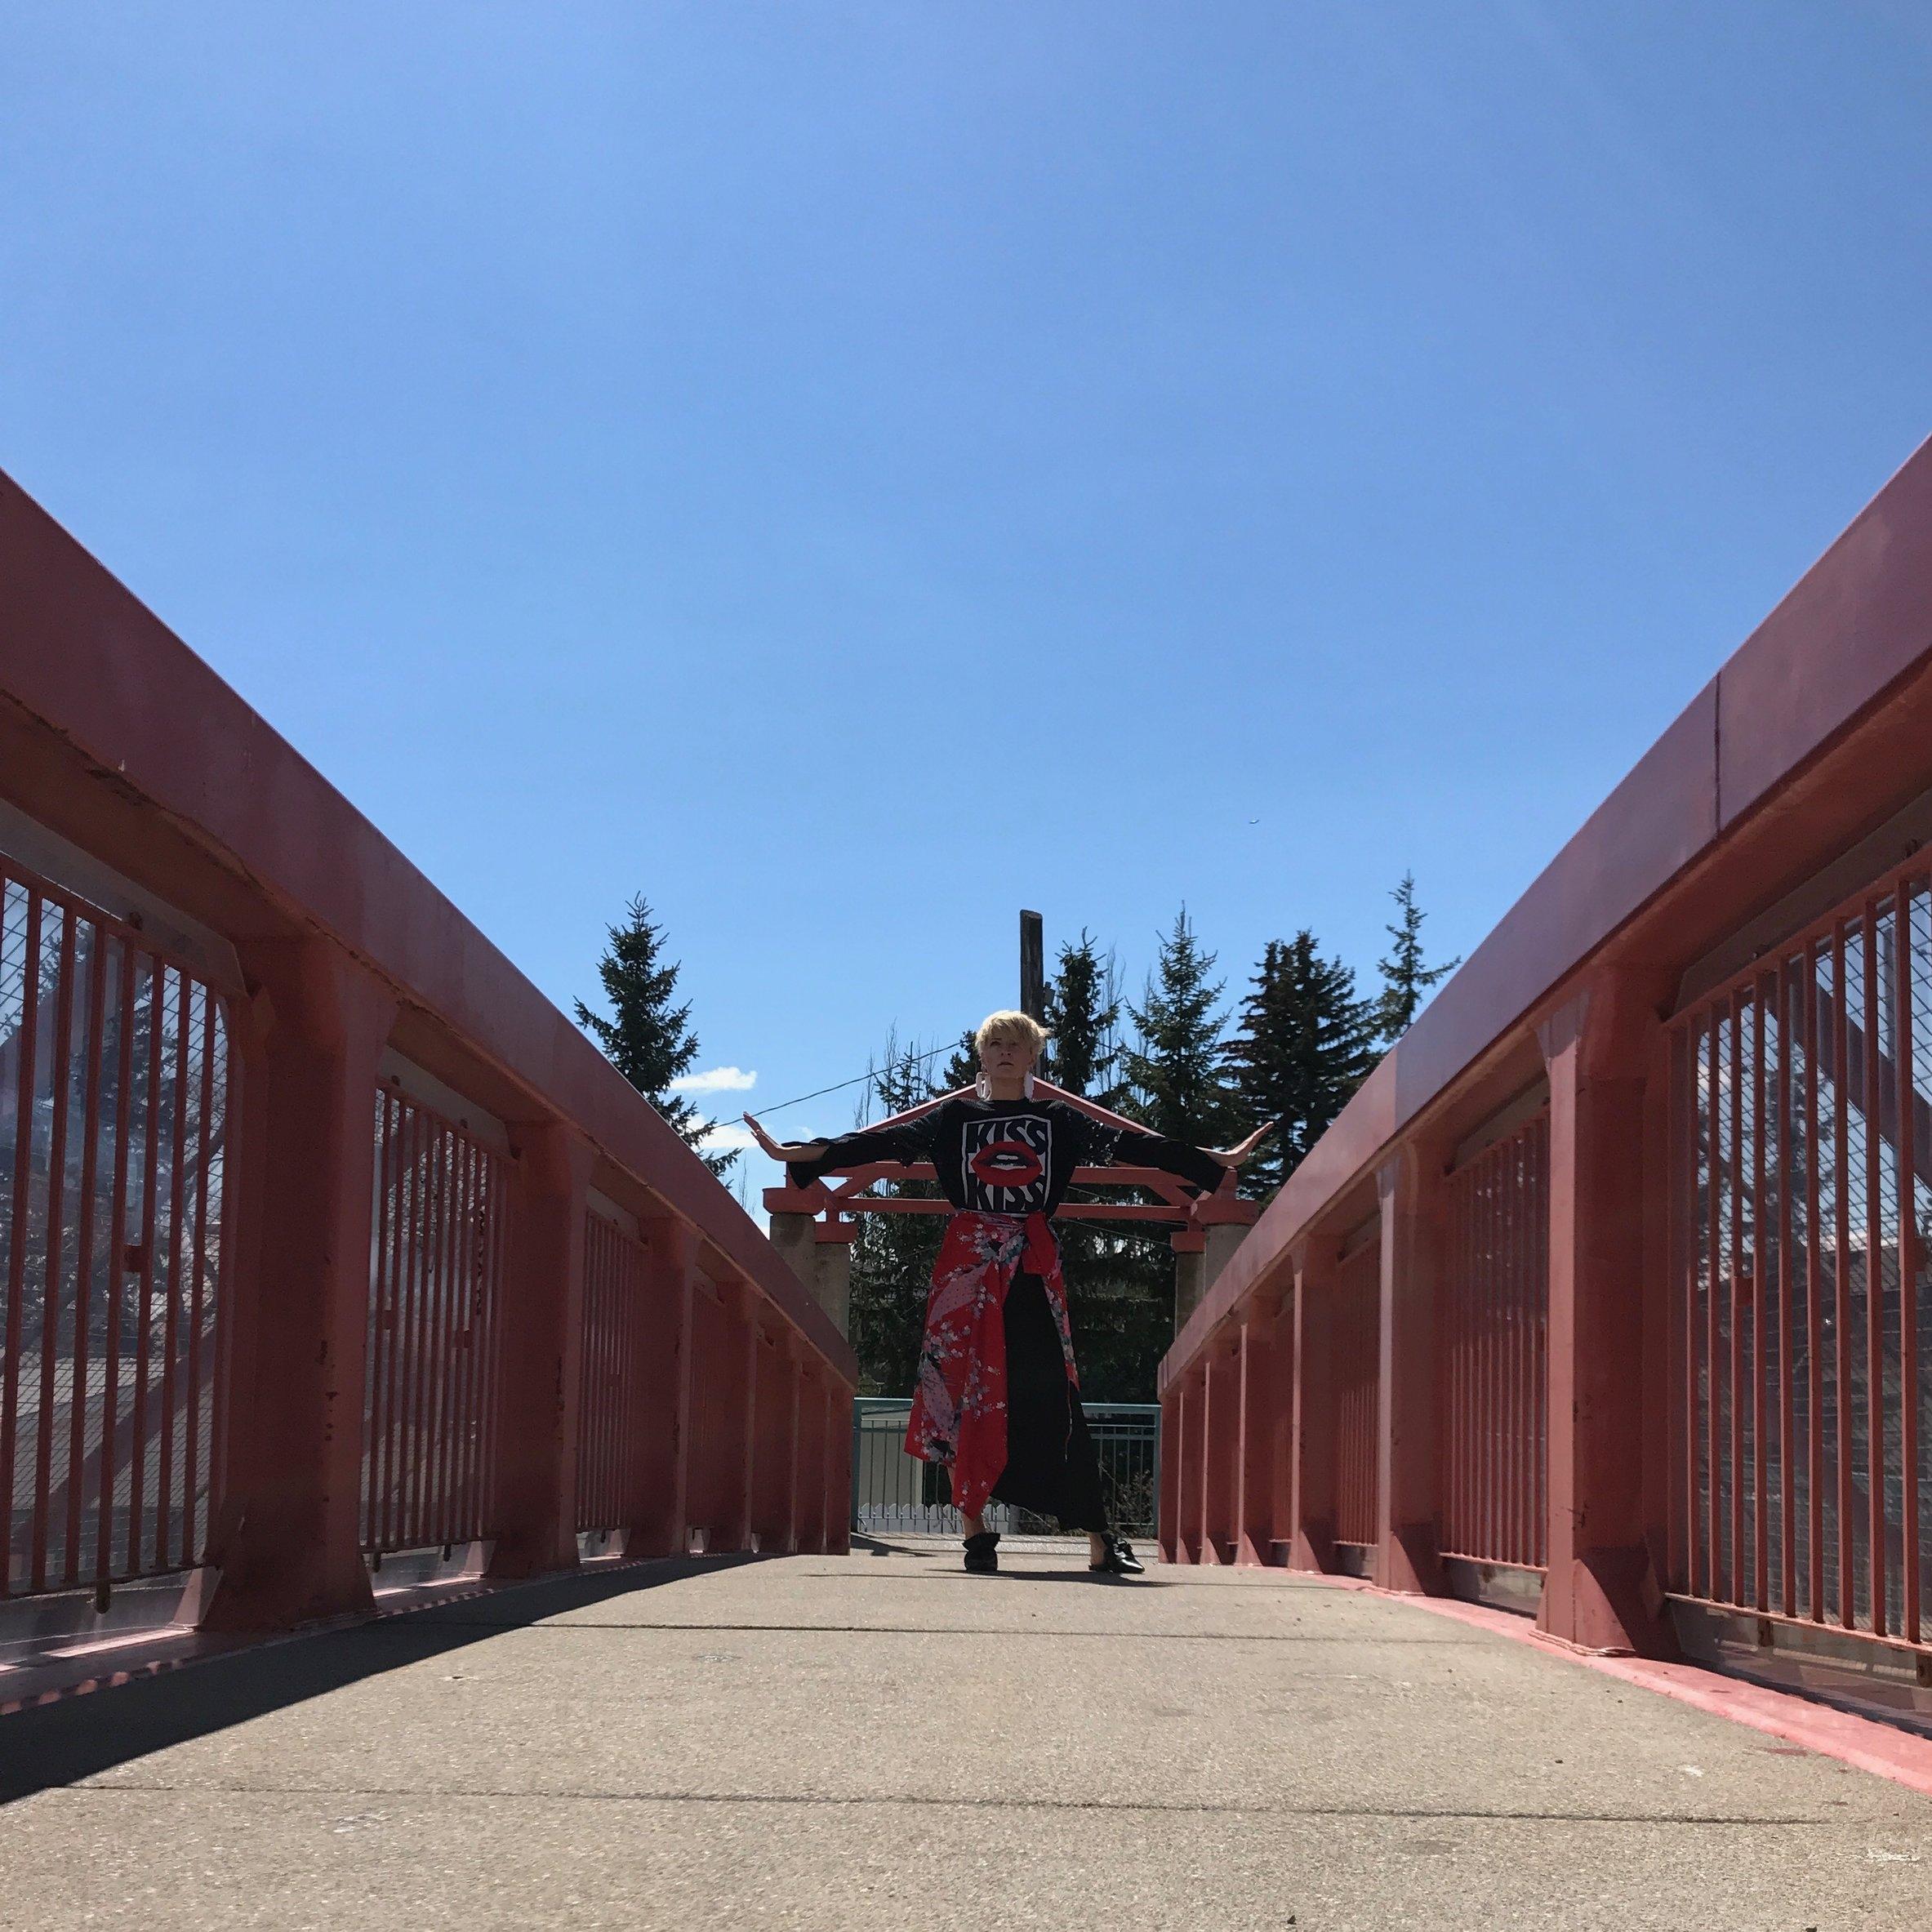 Credit: Photo - Anonymous, Styling - Sarah G. Schmidt, Location - Nose Hill Mall Pedestrain Bridge